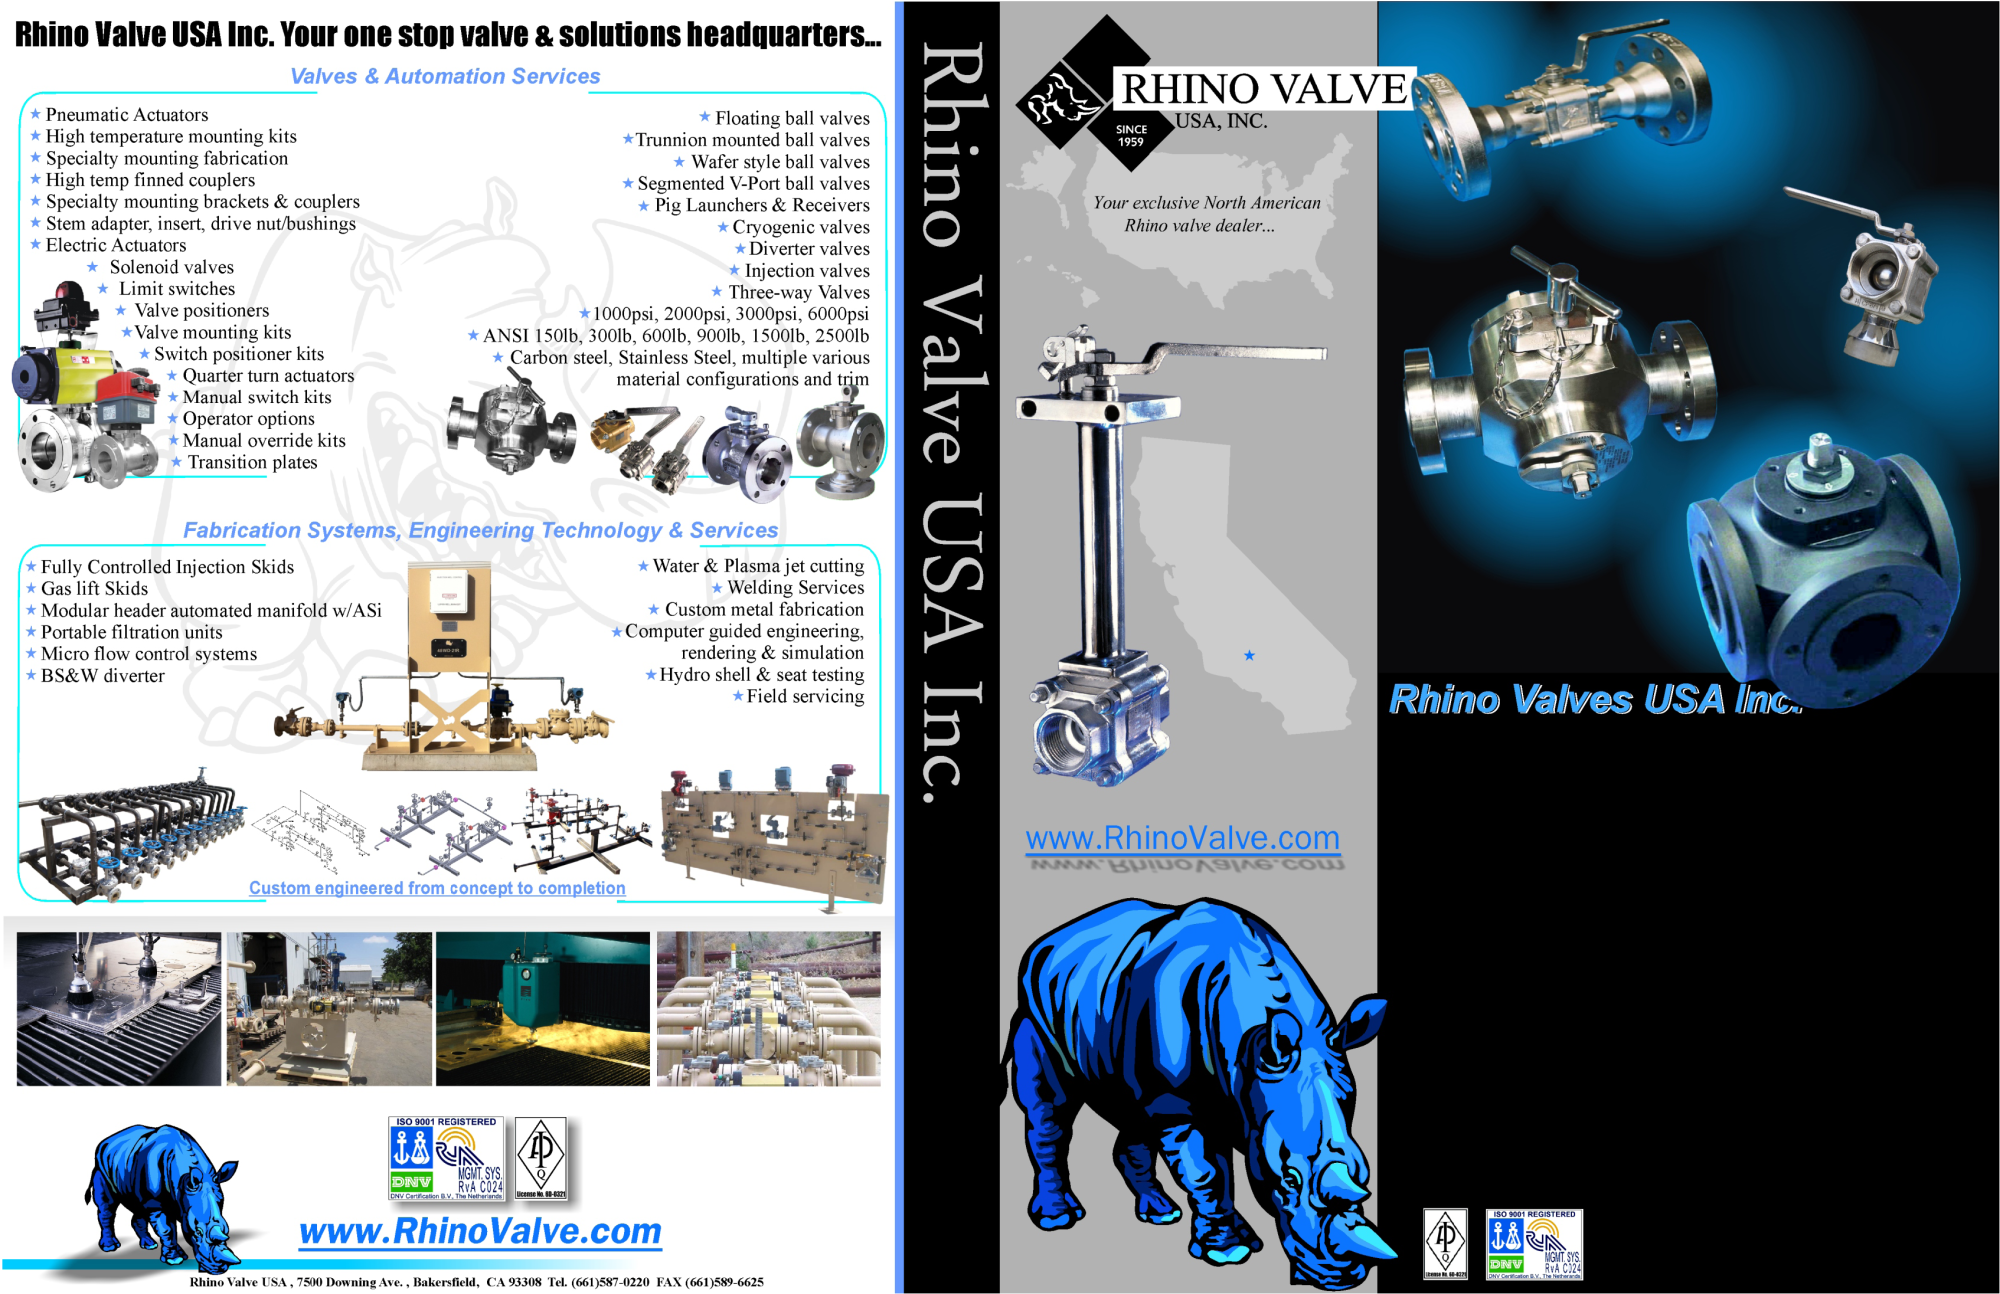 Rhino Valve USA